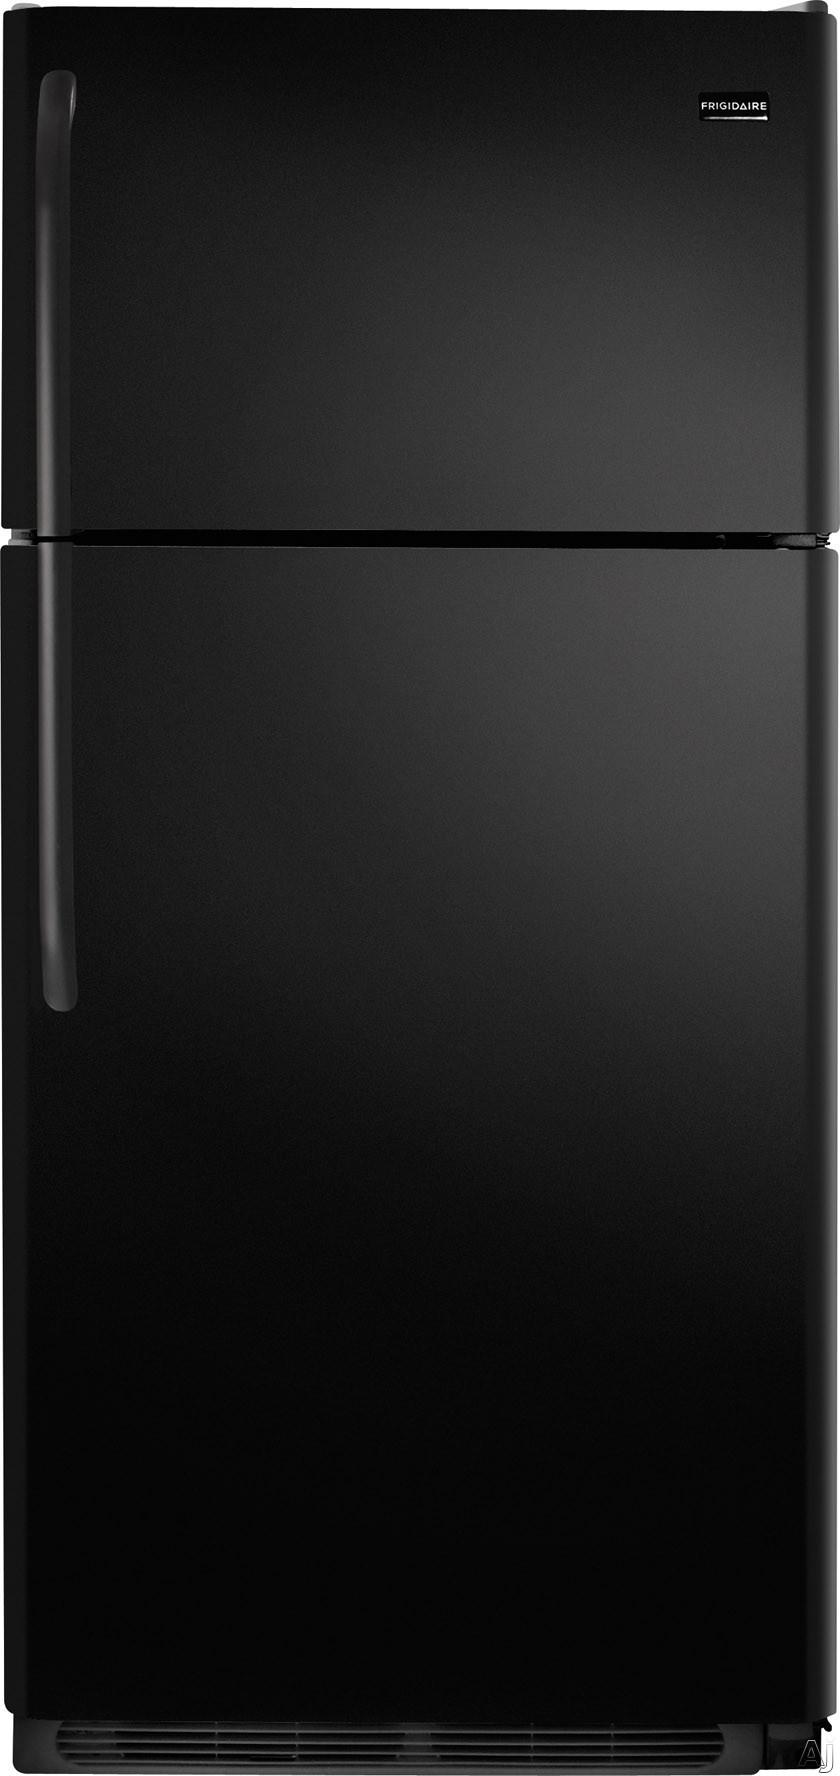 Frigidaire FFHI1831QE 30 Inch Top-Freezer Refrigerator with 18.0 cu. ft. Capacity, 2 SpillSafe Glass Shelves, Gallon Door Storage, 2 Crisper Drawers, 1 Deli Drawer, 3 Door Racks, Covered Dairy Bin, ADA Compliant, ENERGY STAR Qualified and Ice Maker: Black